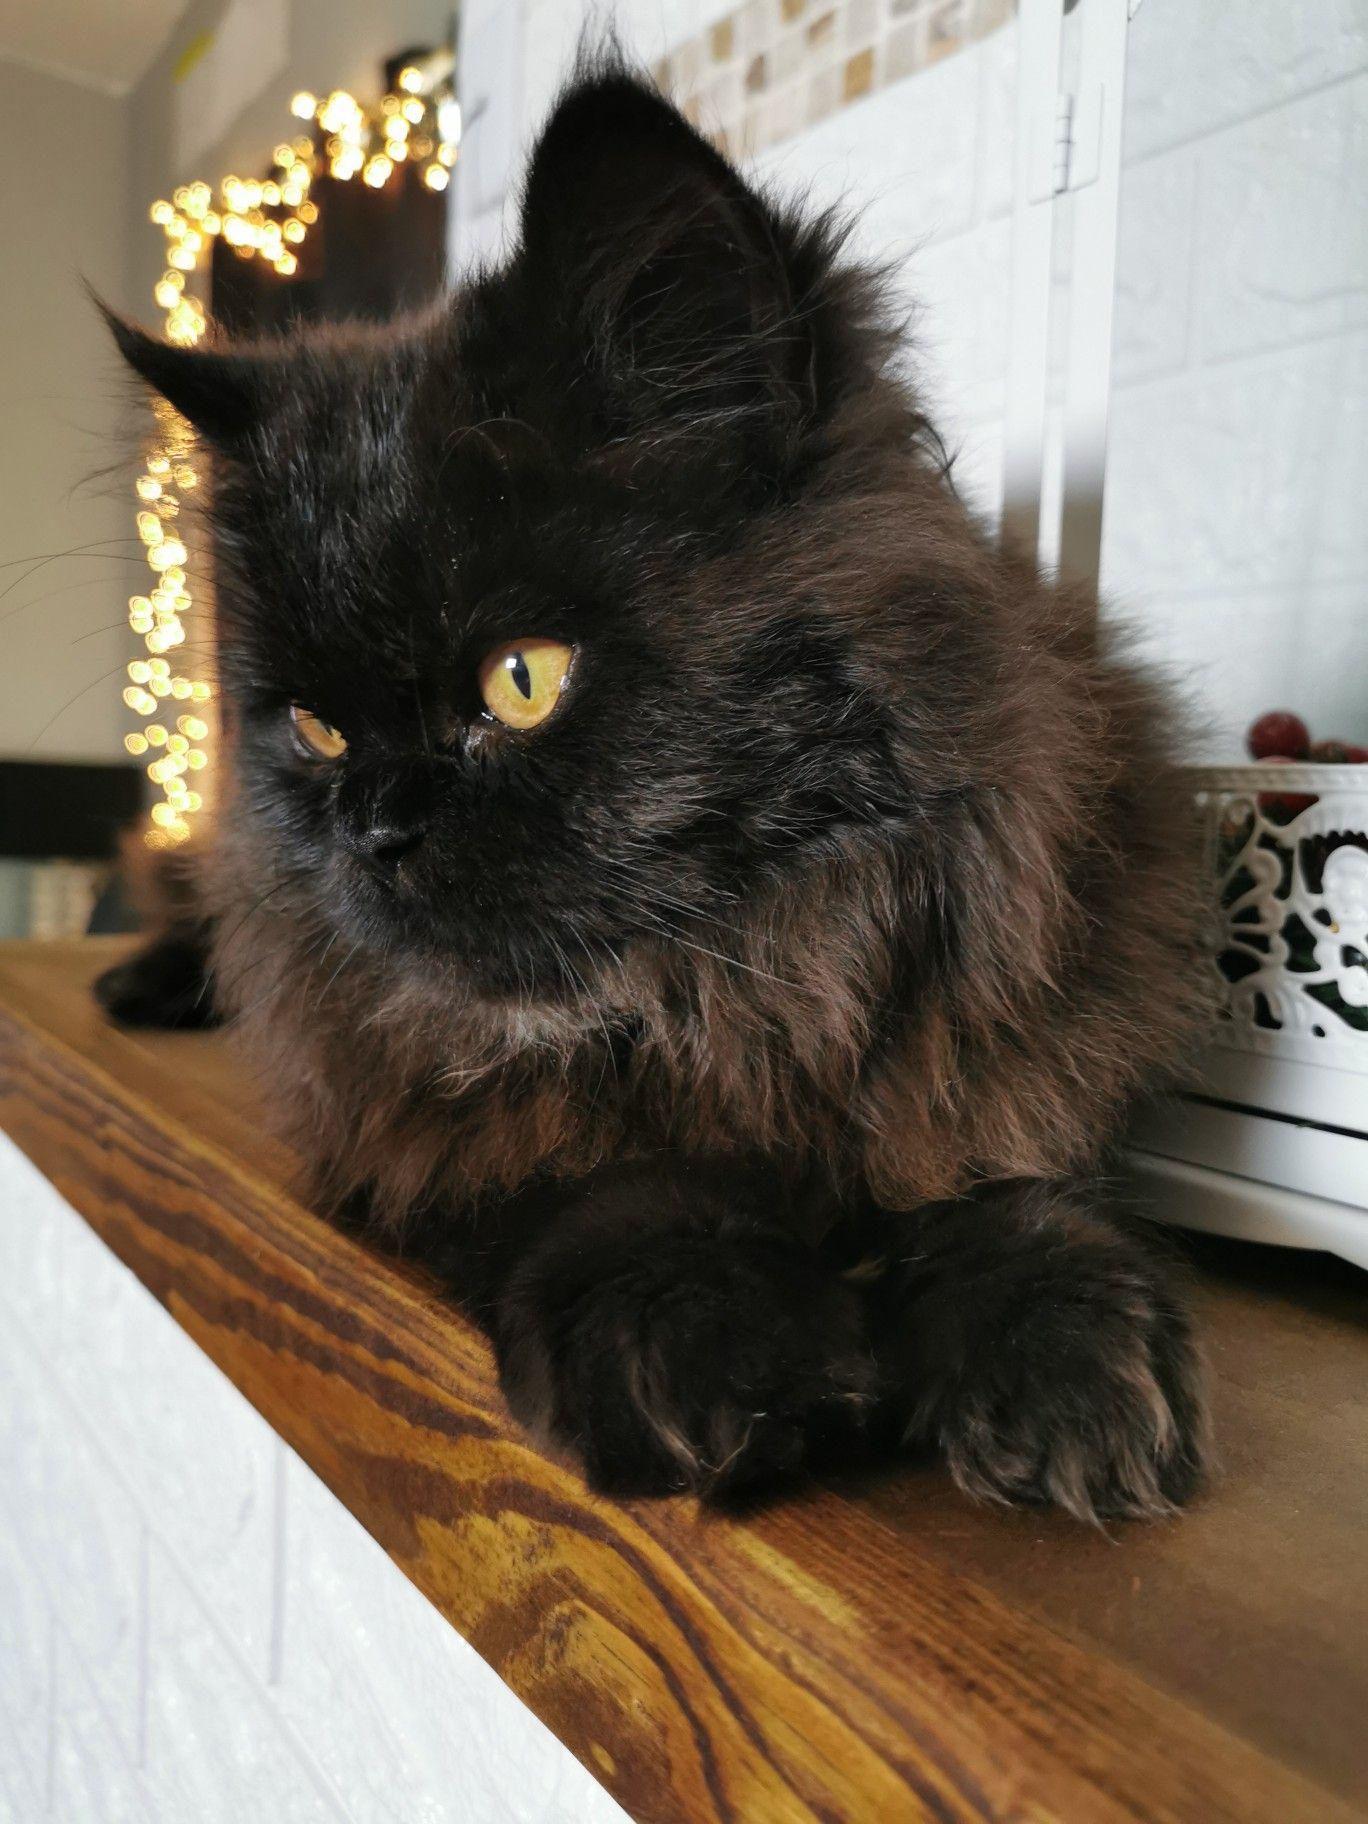 Gato persa color chocolate #rengartheinstacat #rengar #kittens #gatitos #persiancat #persiancatstagram #persiancats #persiancatlovers #gatospersas #gatospersa #gatos #gatosmonterrey #gatosmexico #persacat #gatosdeinstagram #catsofinstagram